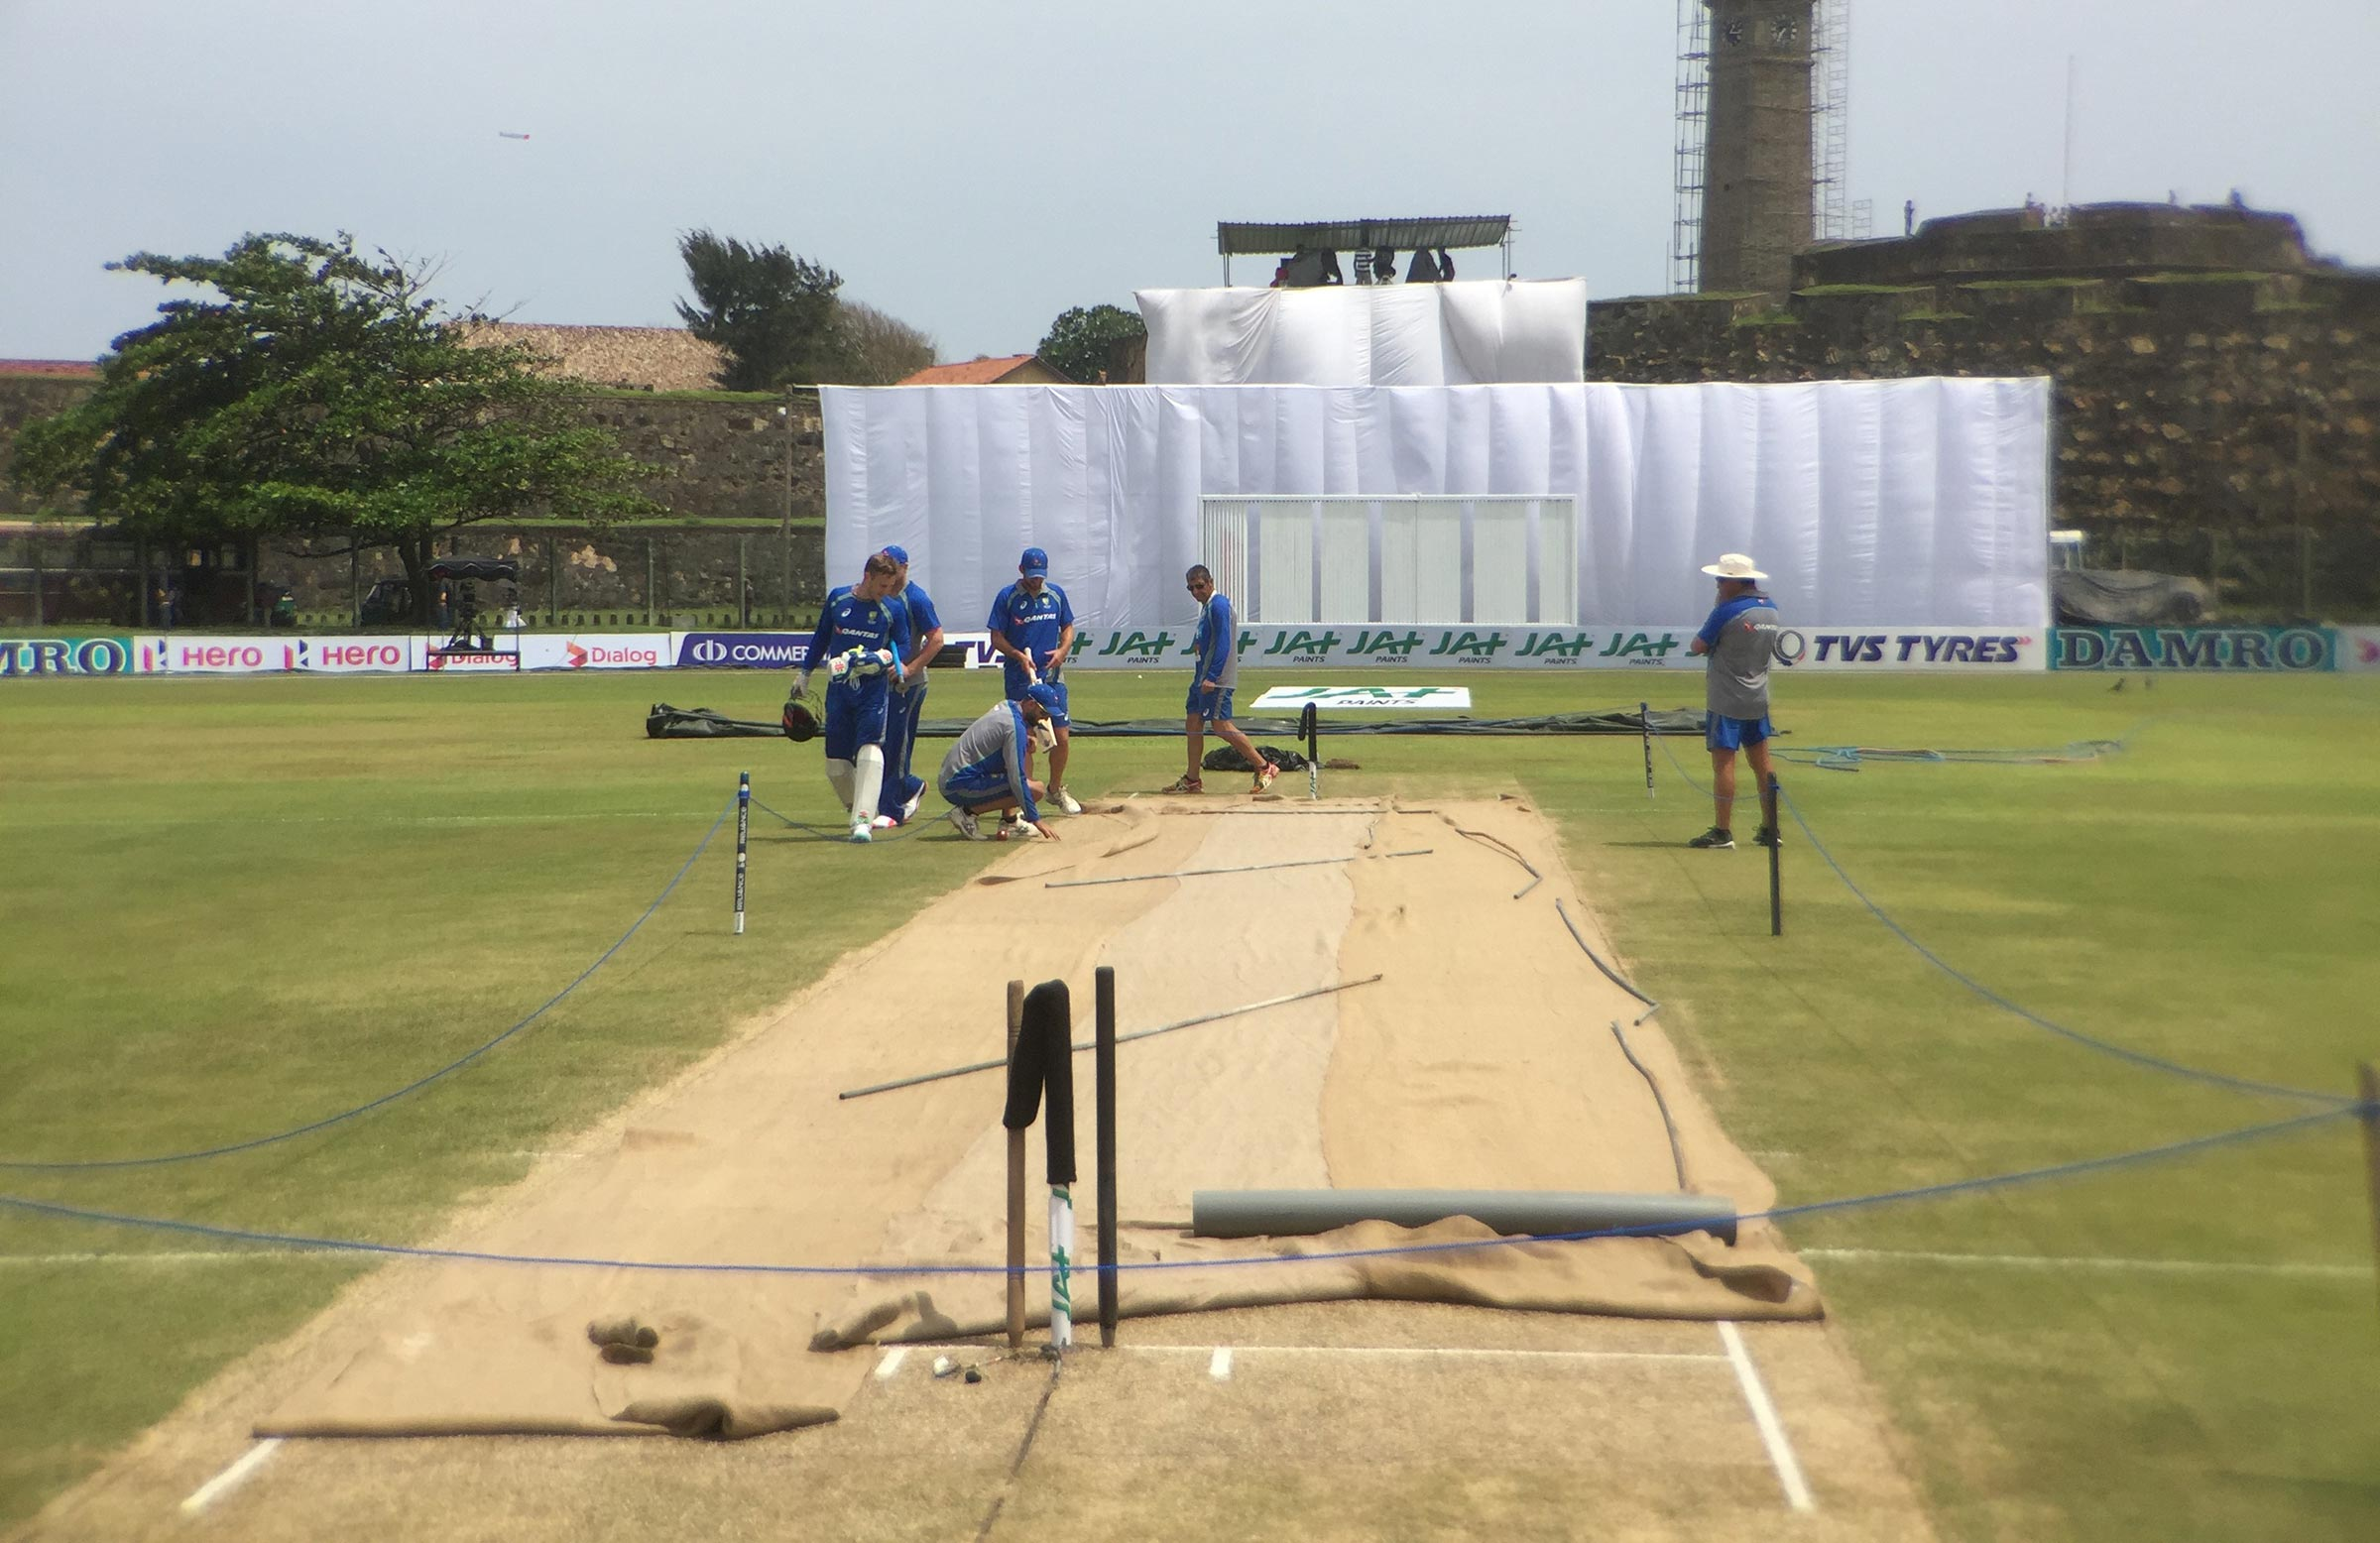 The Australians inspect the Galle pitch on match eve // cricket.com.au